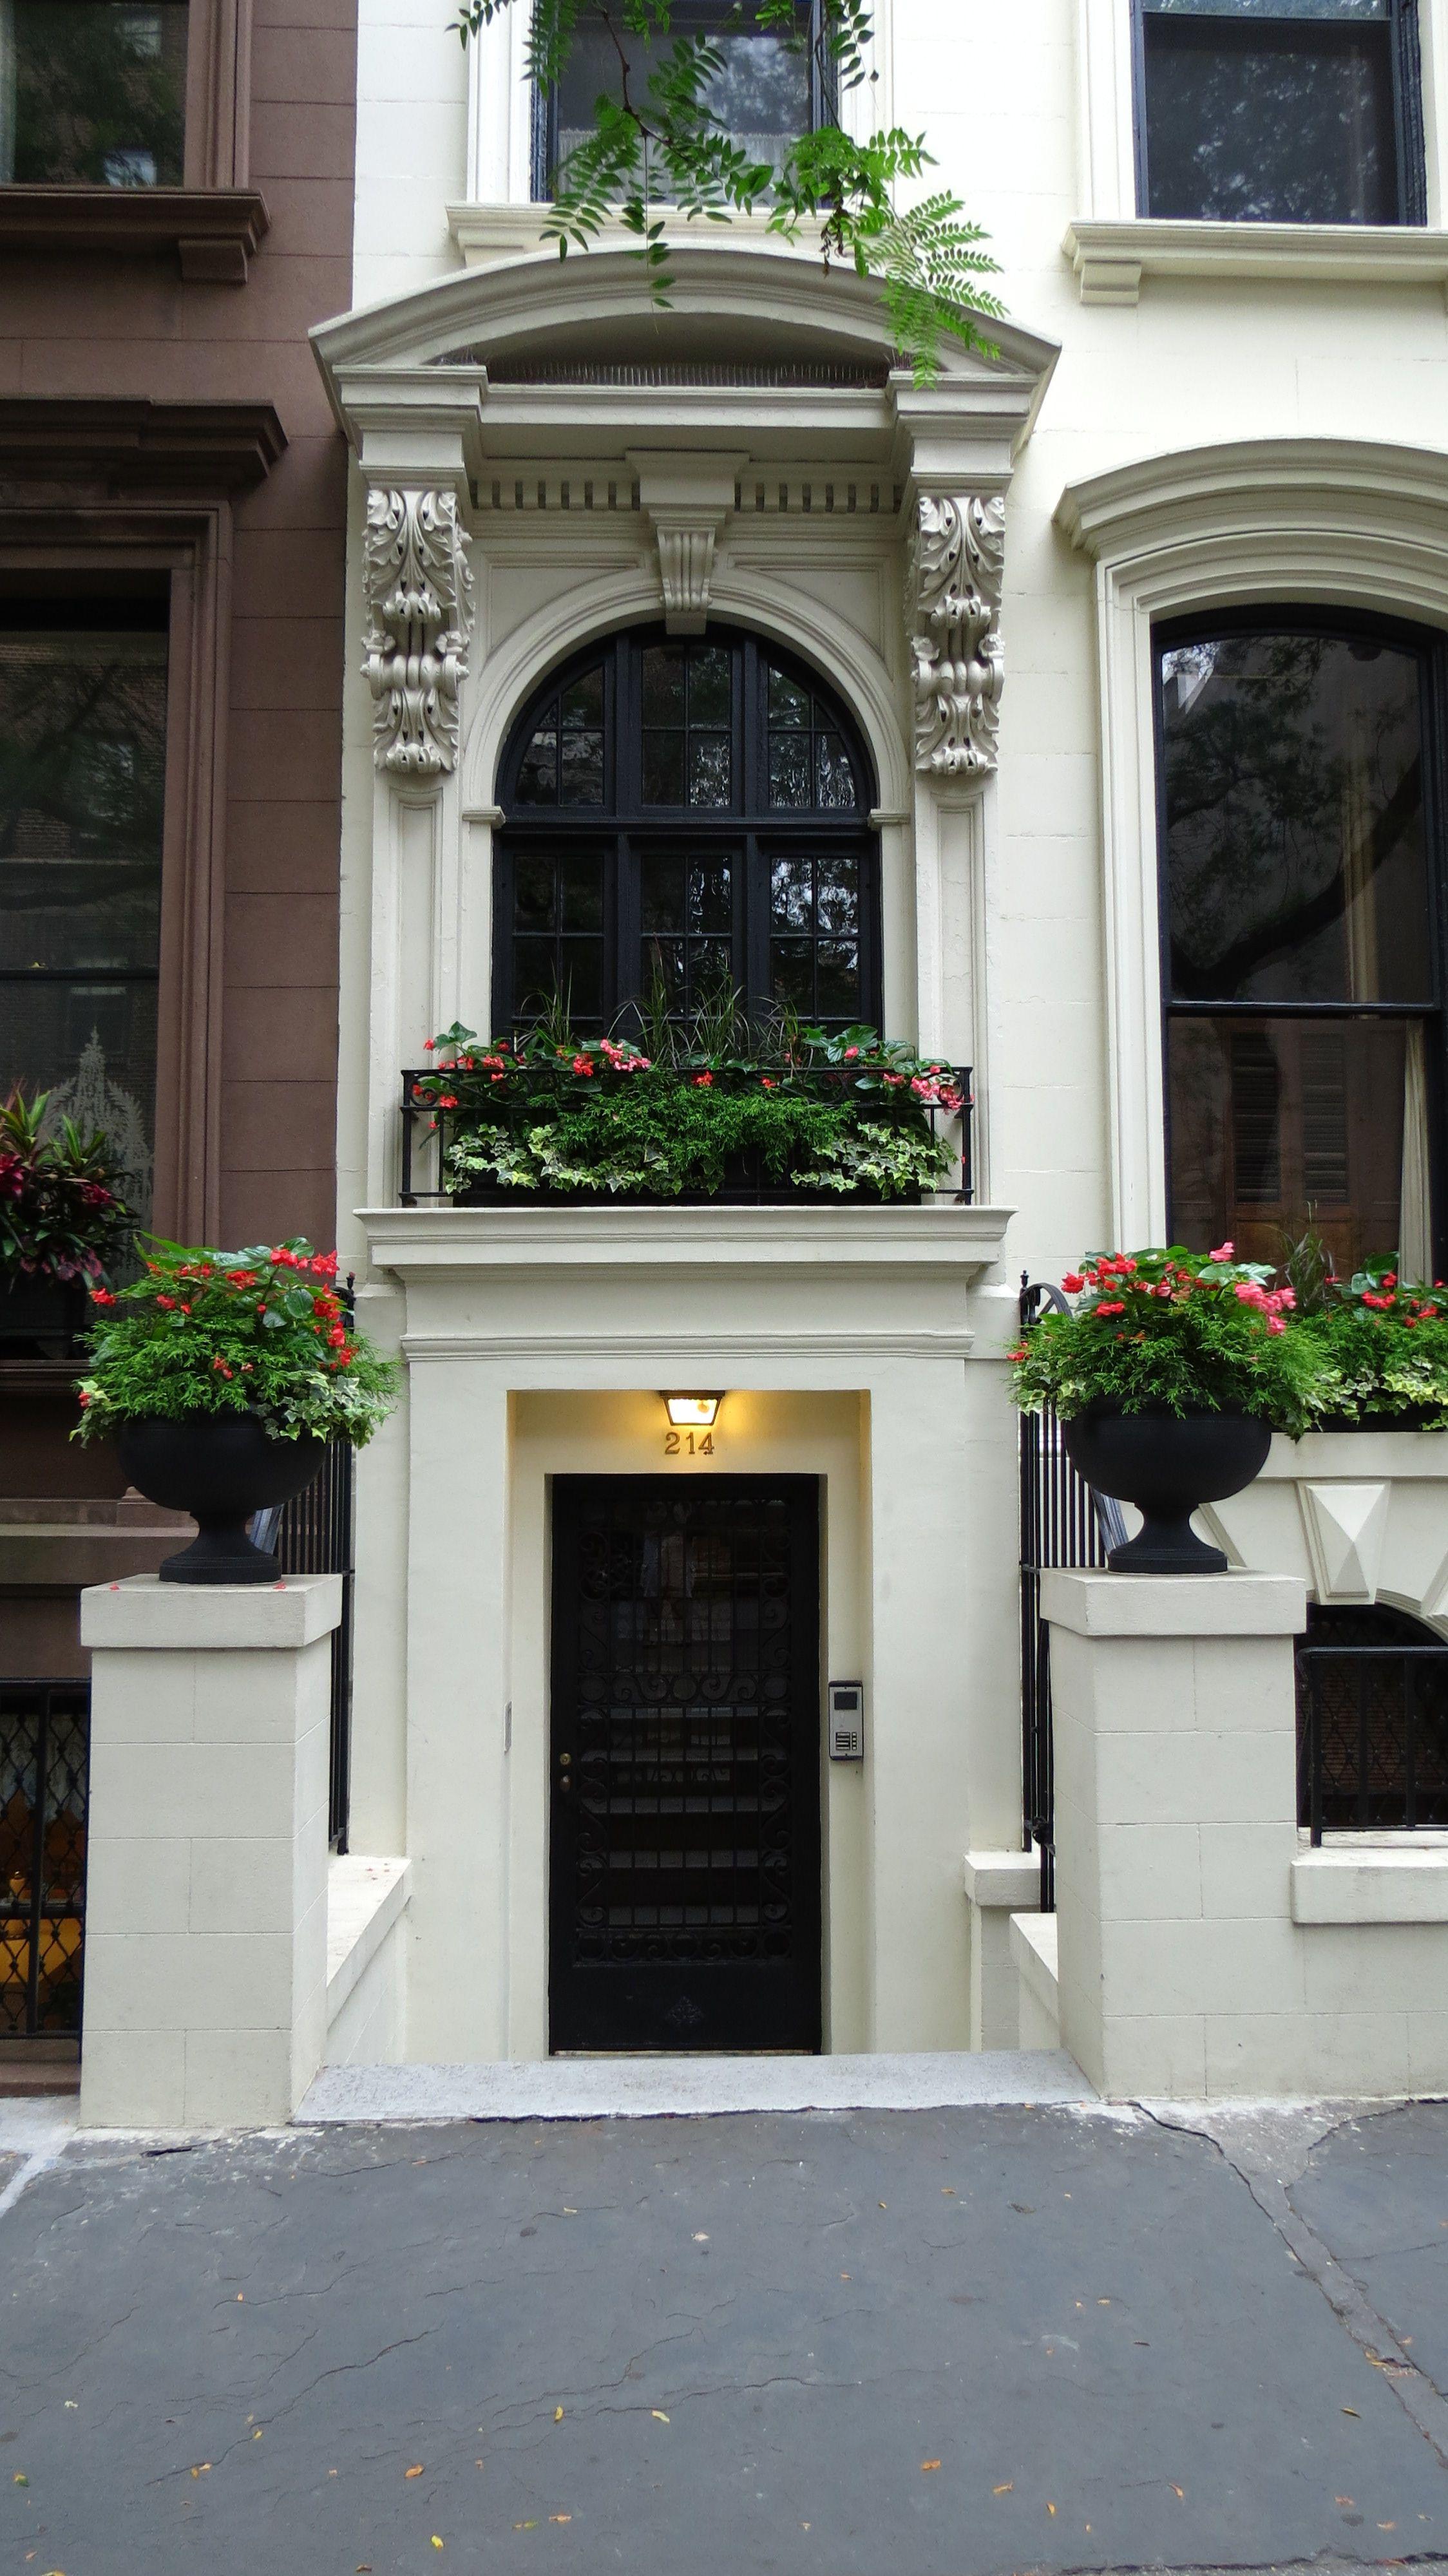 Ingresso esterno di casa fabulous ingresso esterno di - Ingresso casa esterno ...